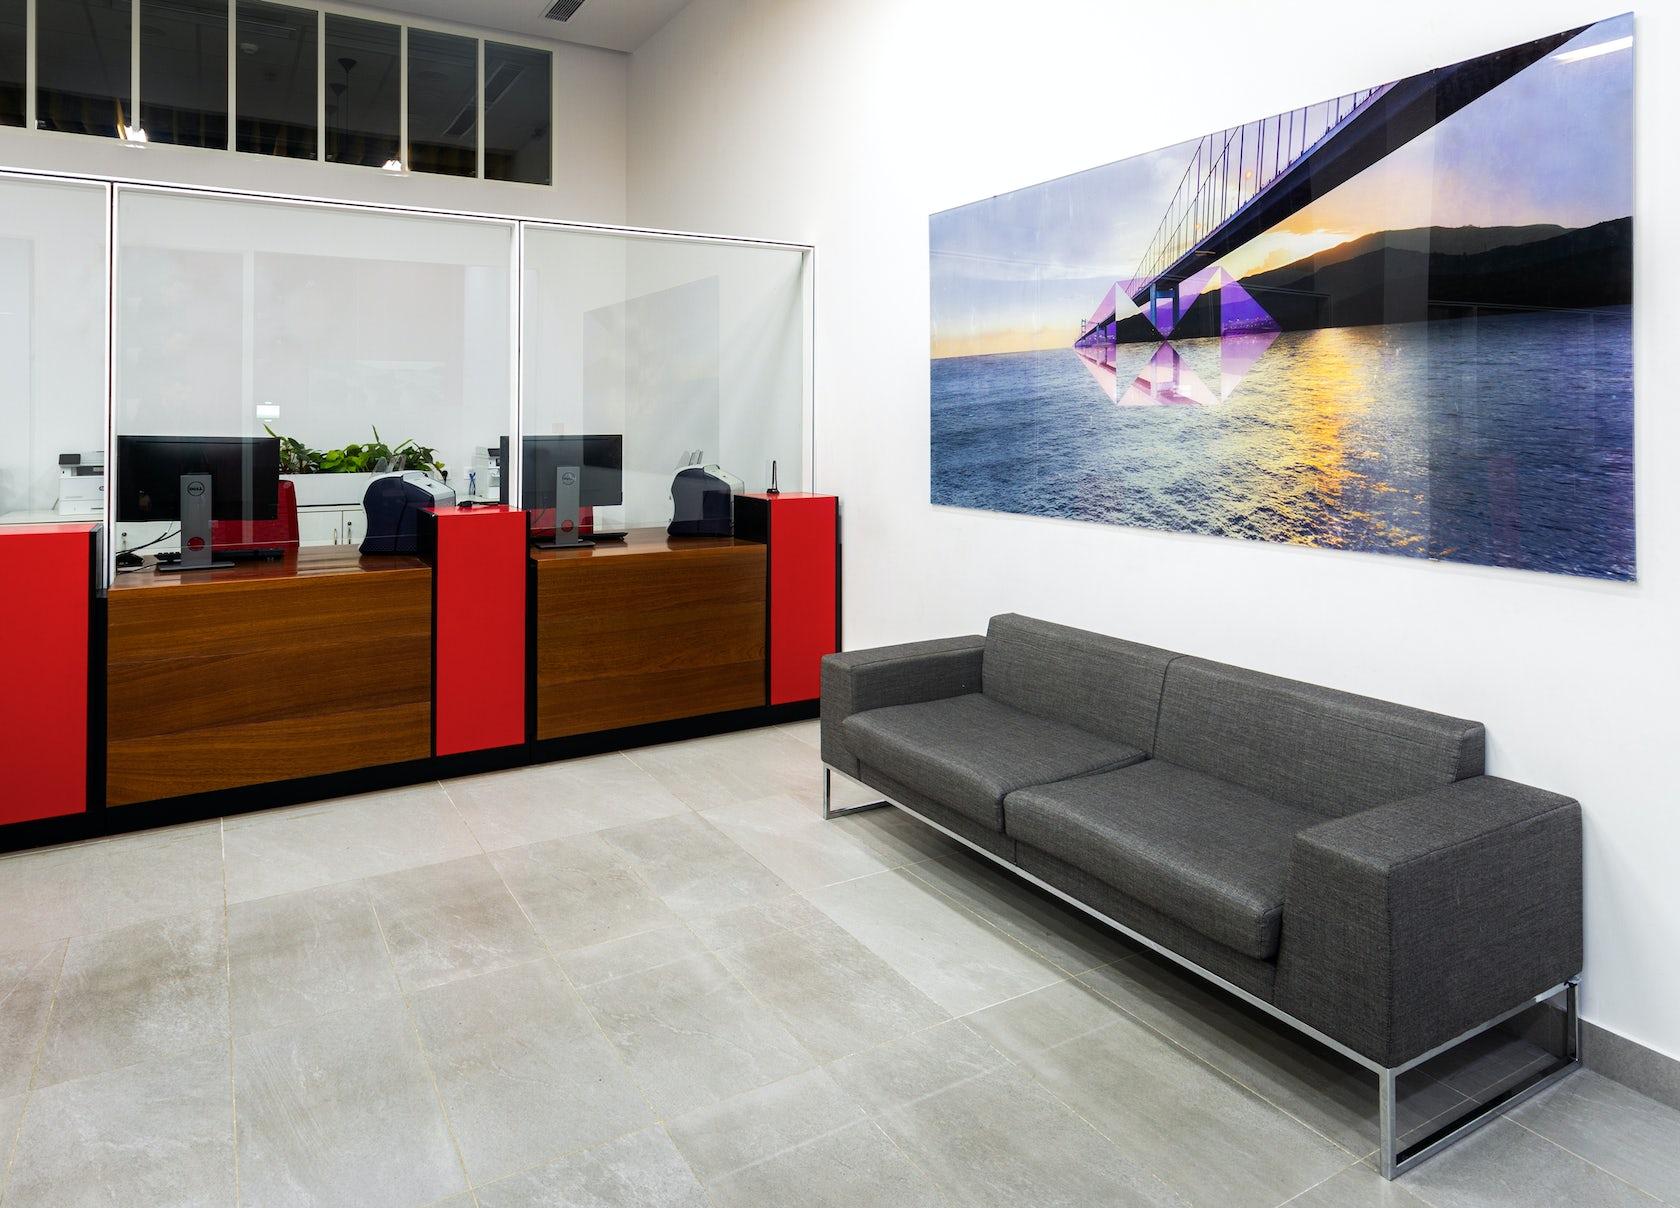 Design Furniture Bab Ezzouar hsbc algiers, algeria on architizer